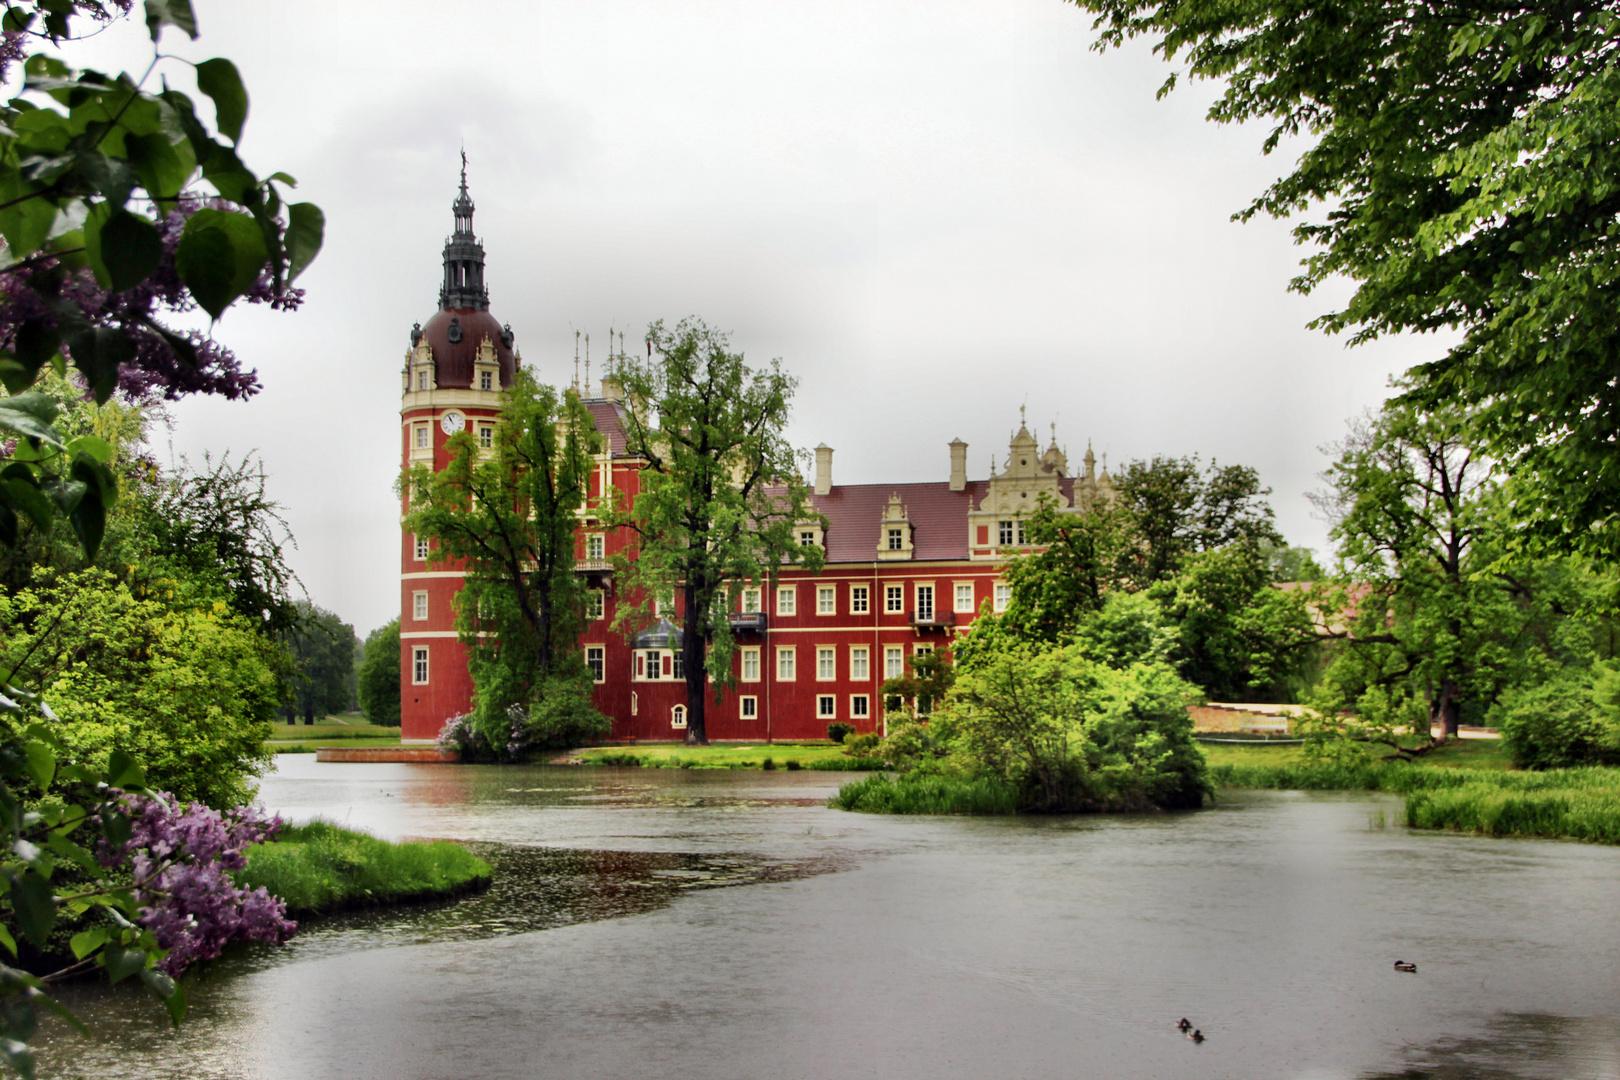 Schloss Bad Muskau